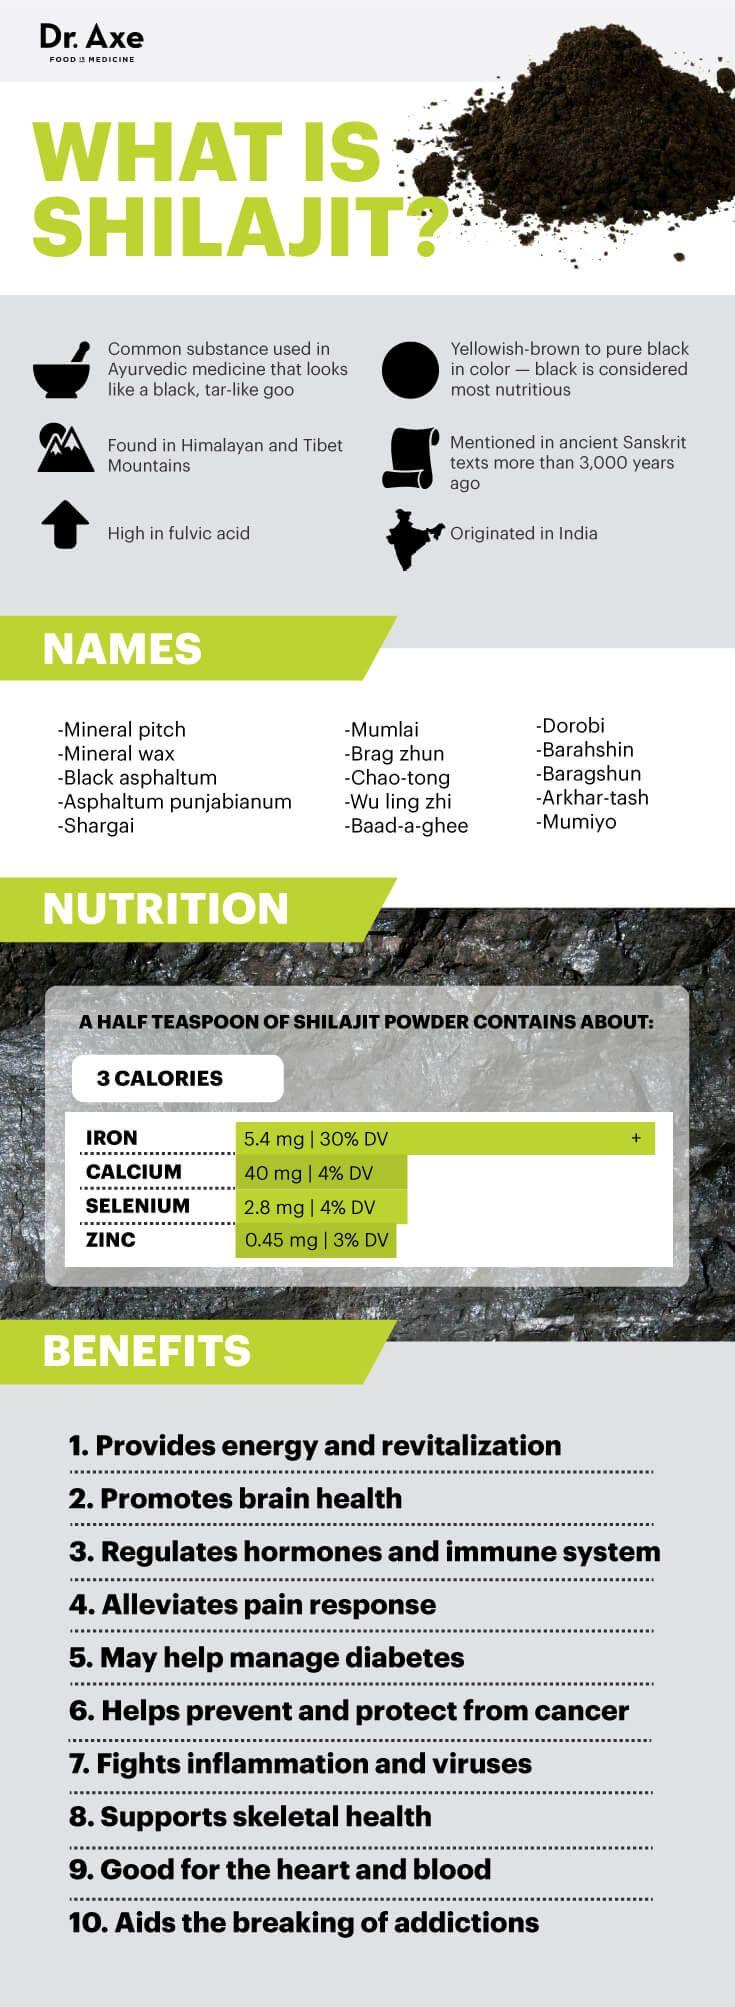 Shilajit Benefits, Shilajit Uses, Shilajit Nutrition, Shilajit Powder - Dr. Axe